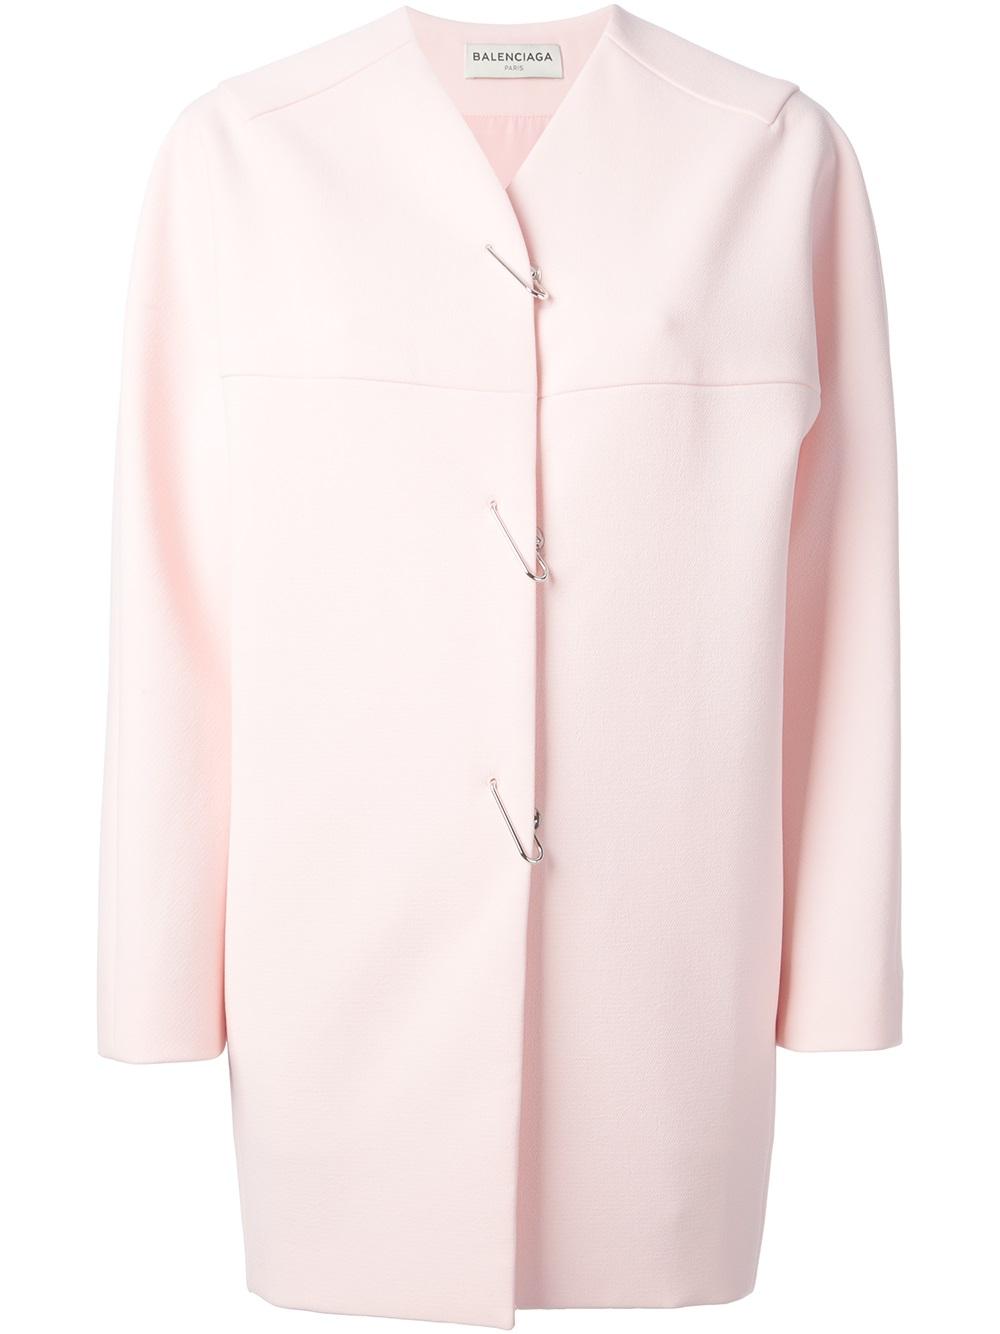 Balenciaga Collarless Coat in Pink | Lyst